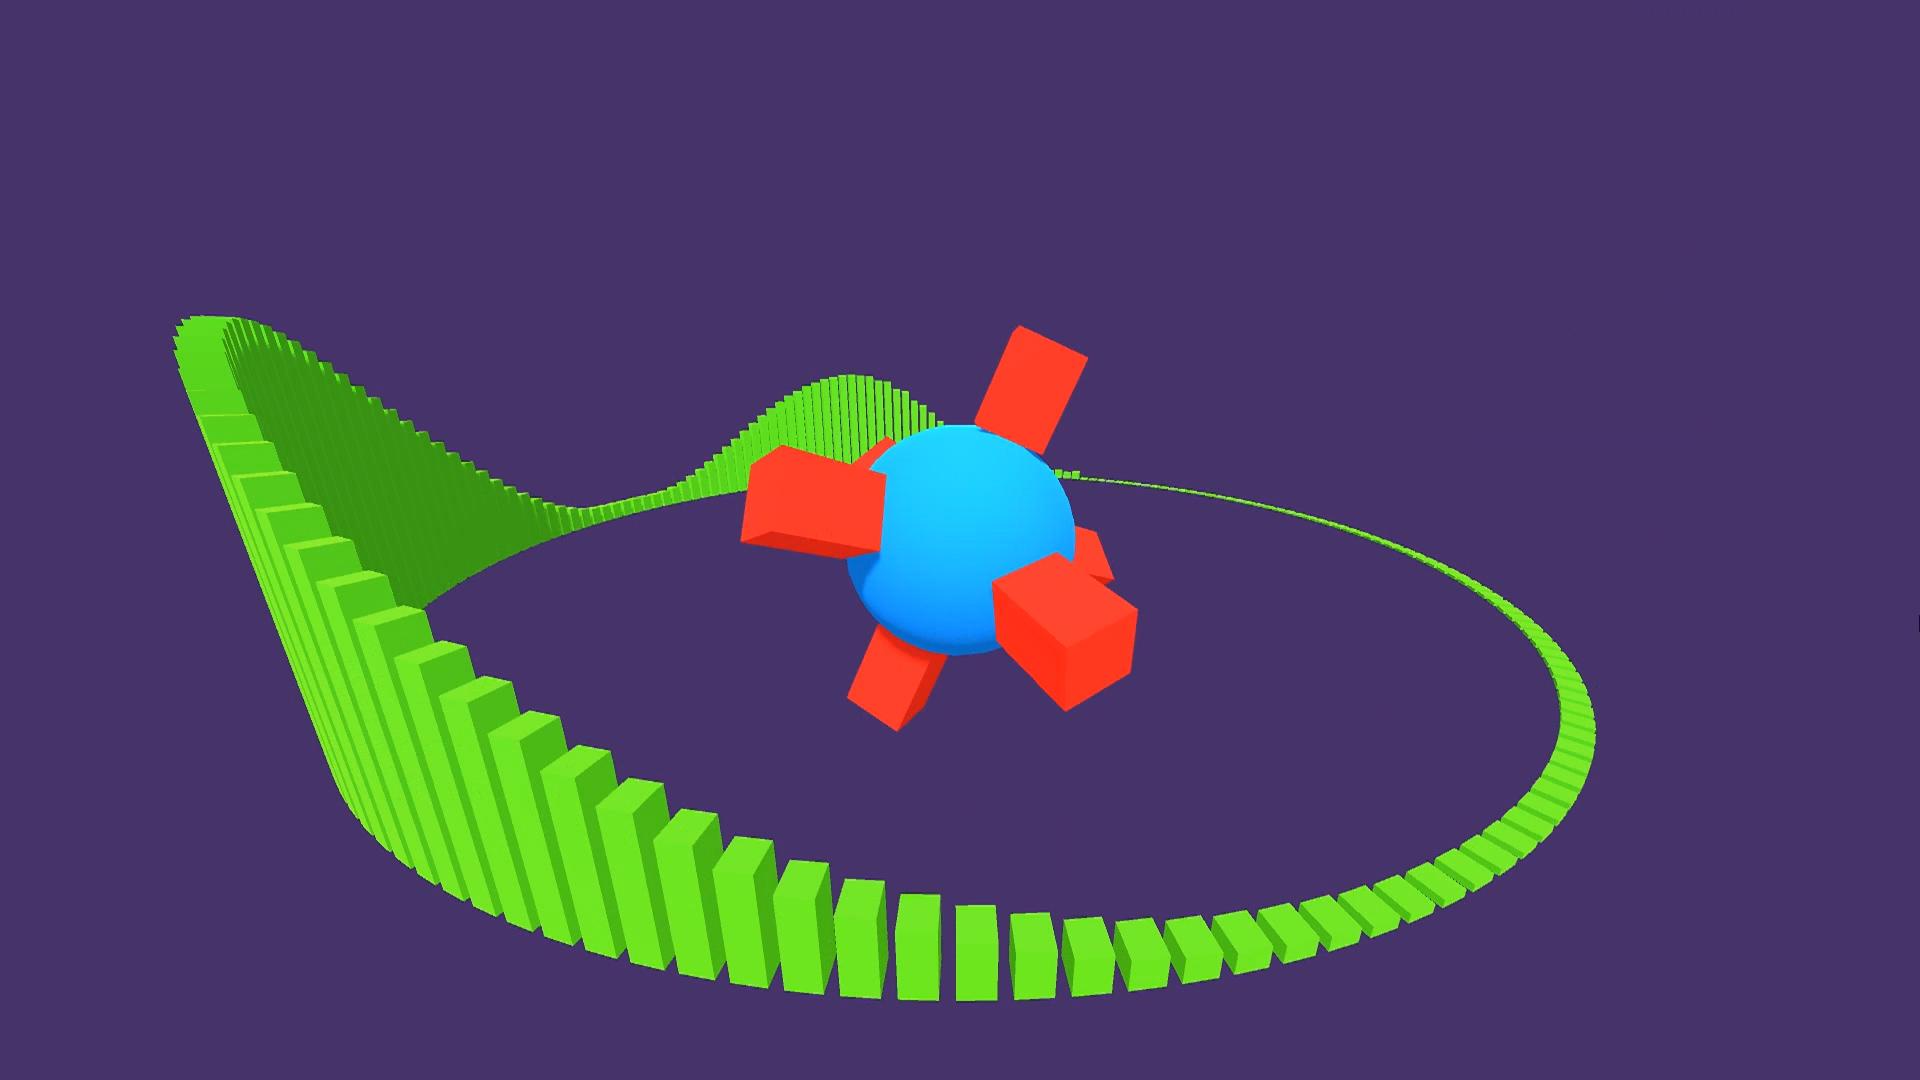 konsfik-procedural-audio-made-in-unity3d-autoplay-mode-screenshot-1